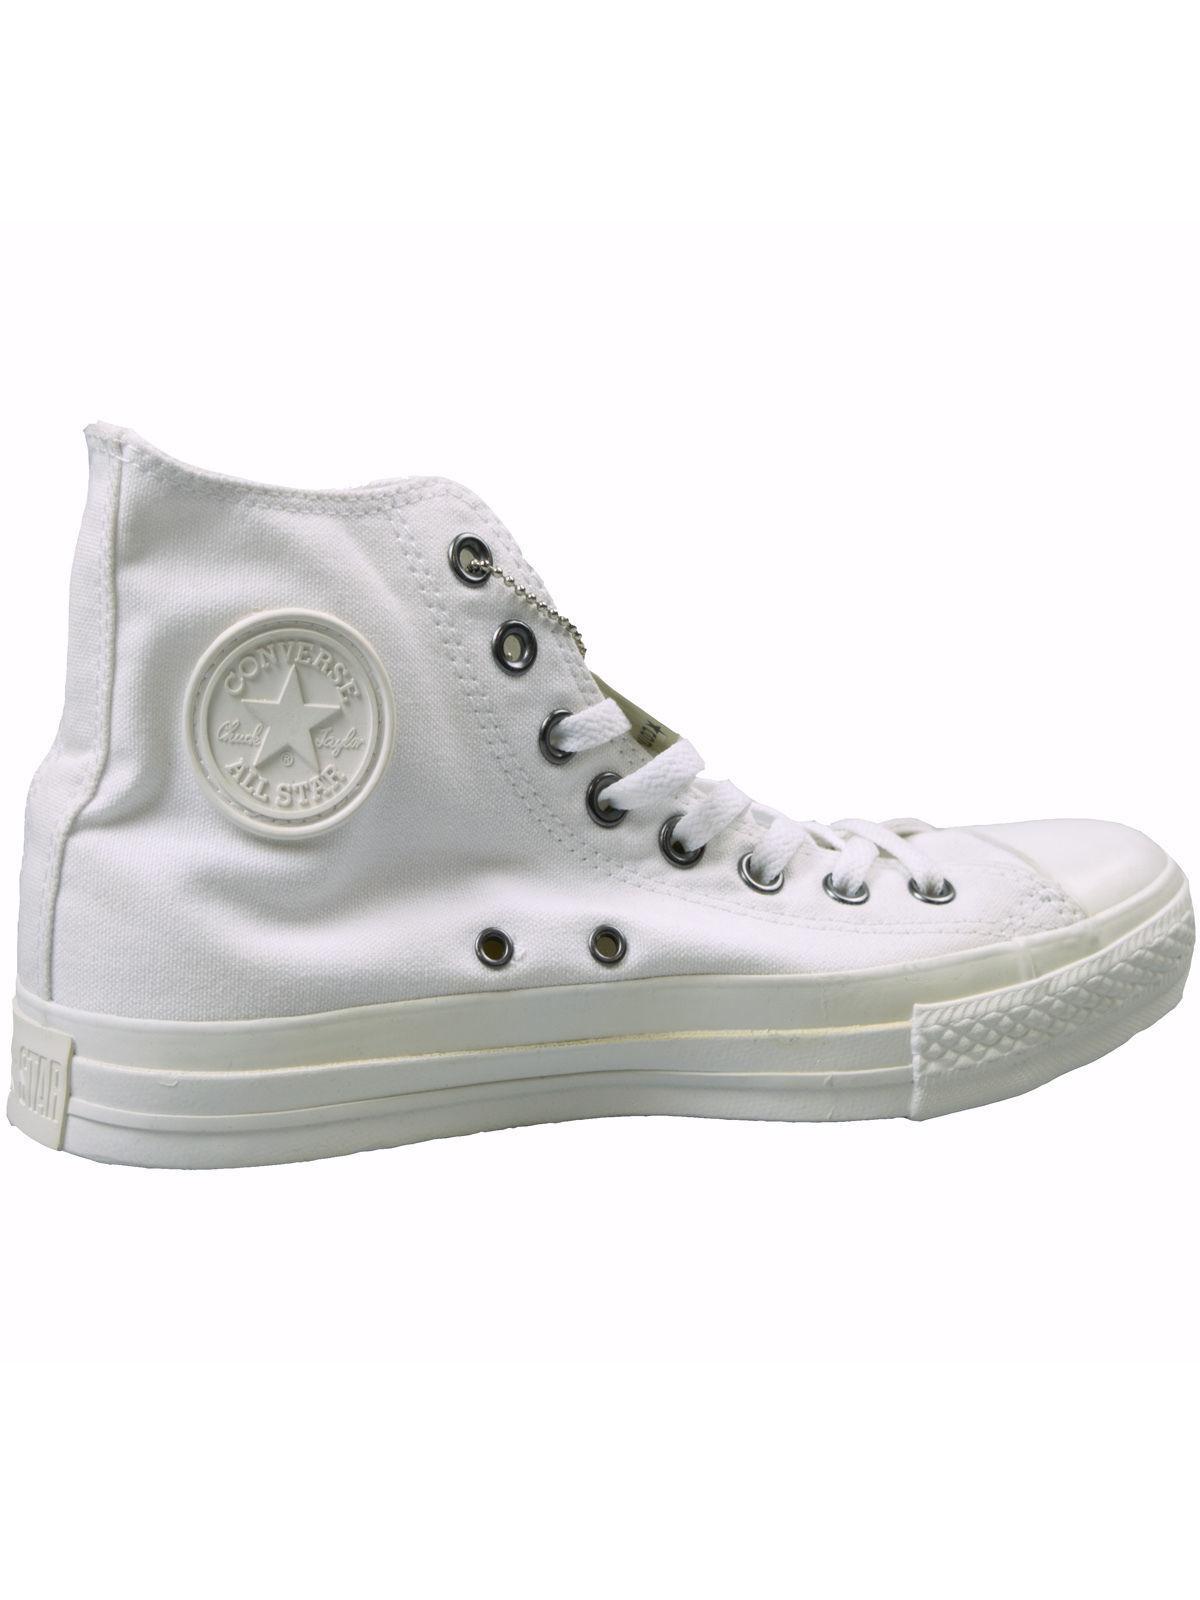 Converse All Star Star All Chucks Sneaker Schuh Weiß / Weiß Mono #5003 661138